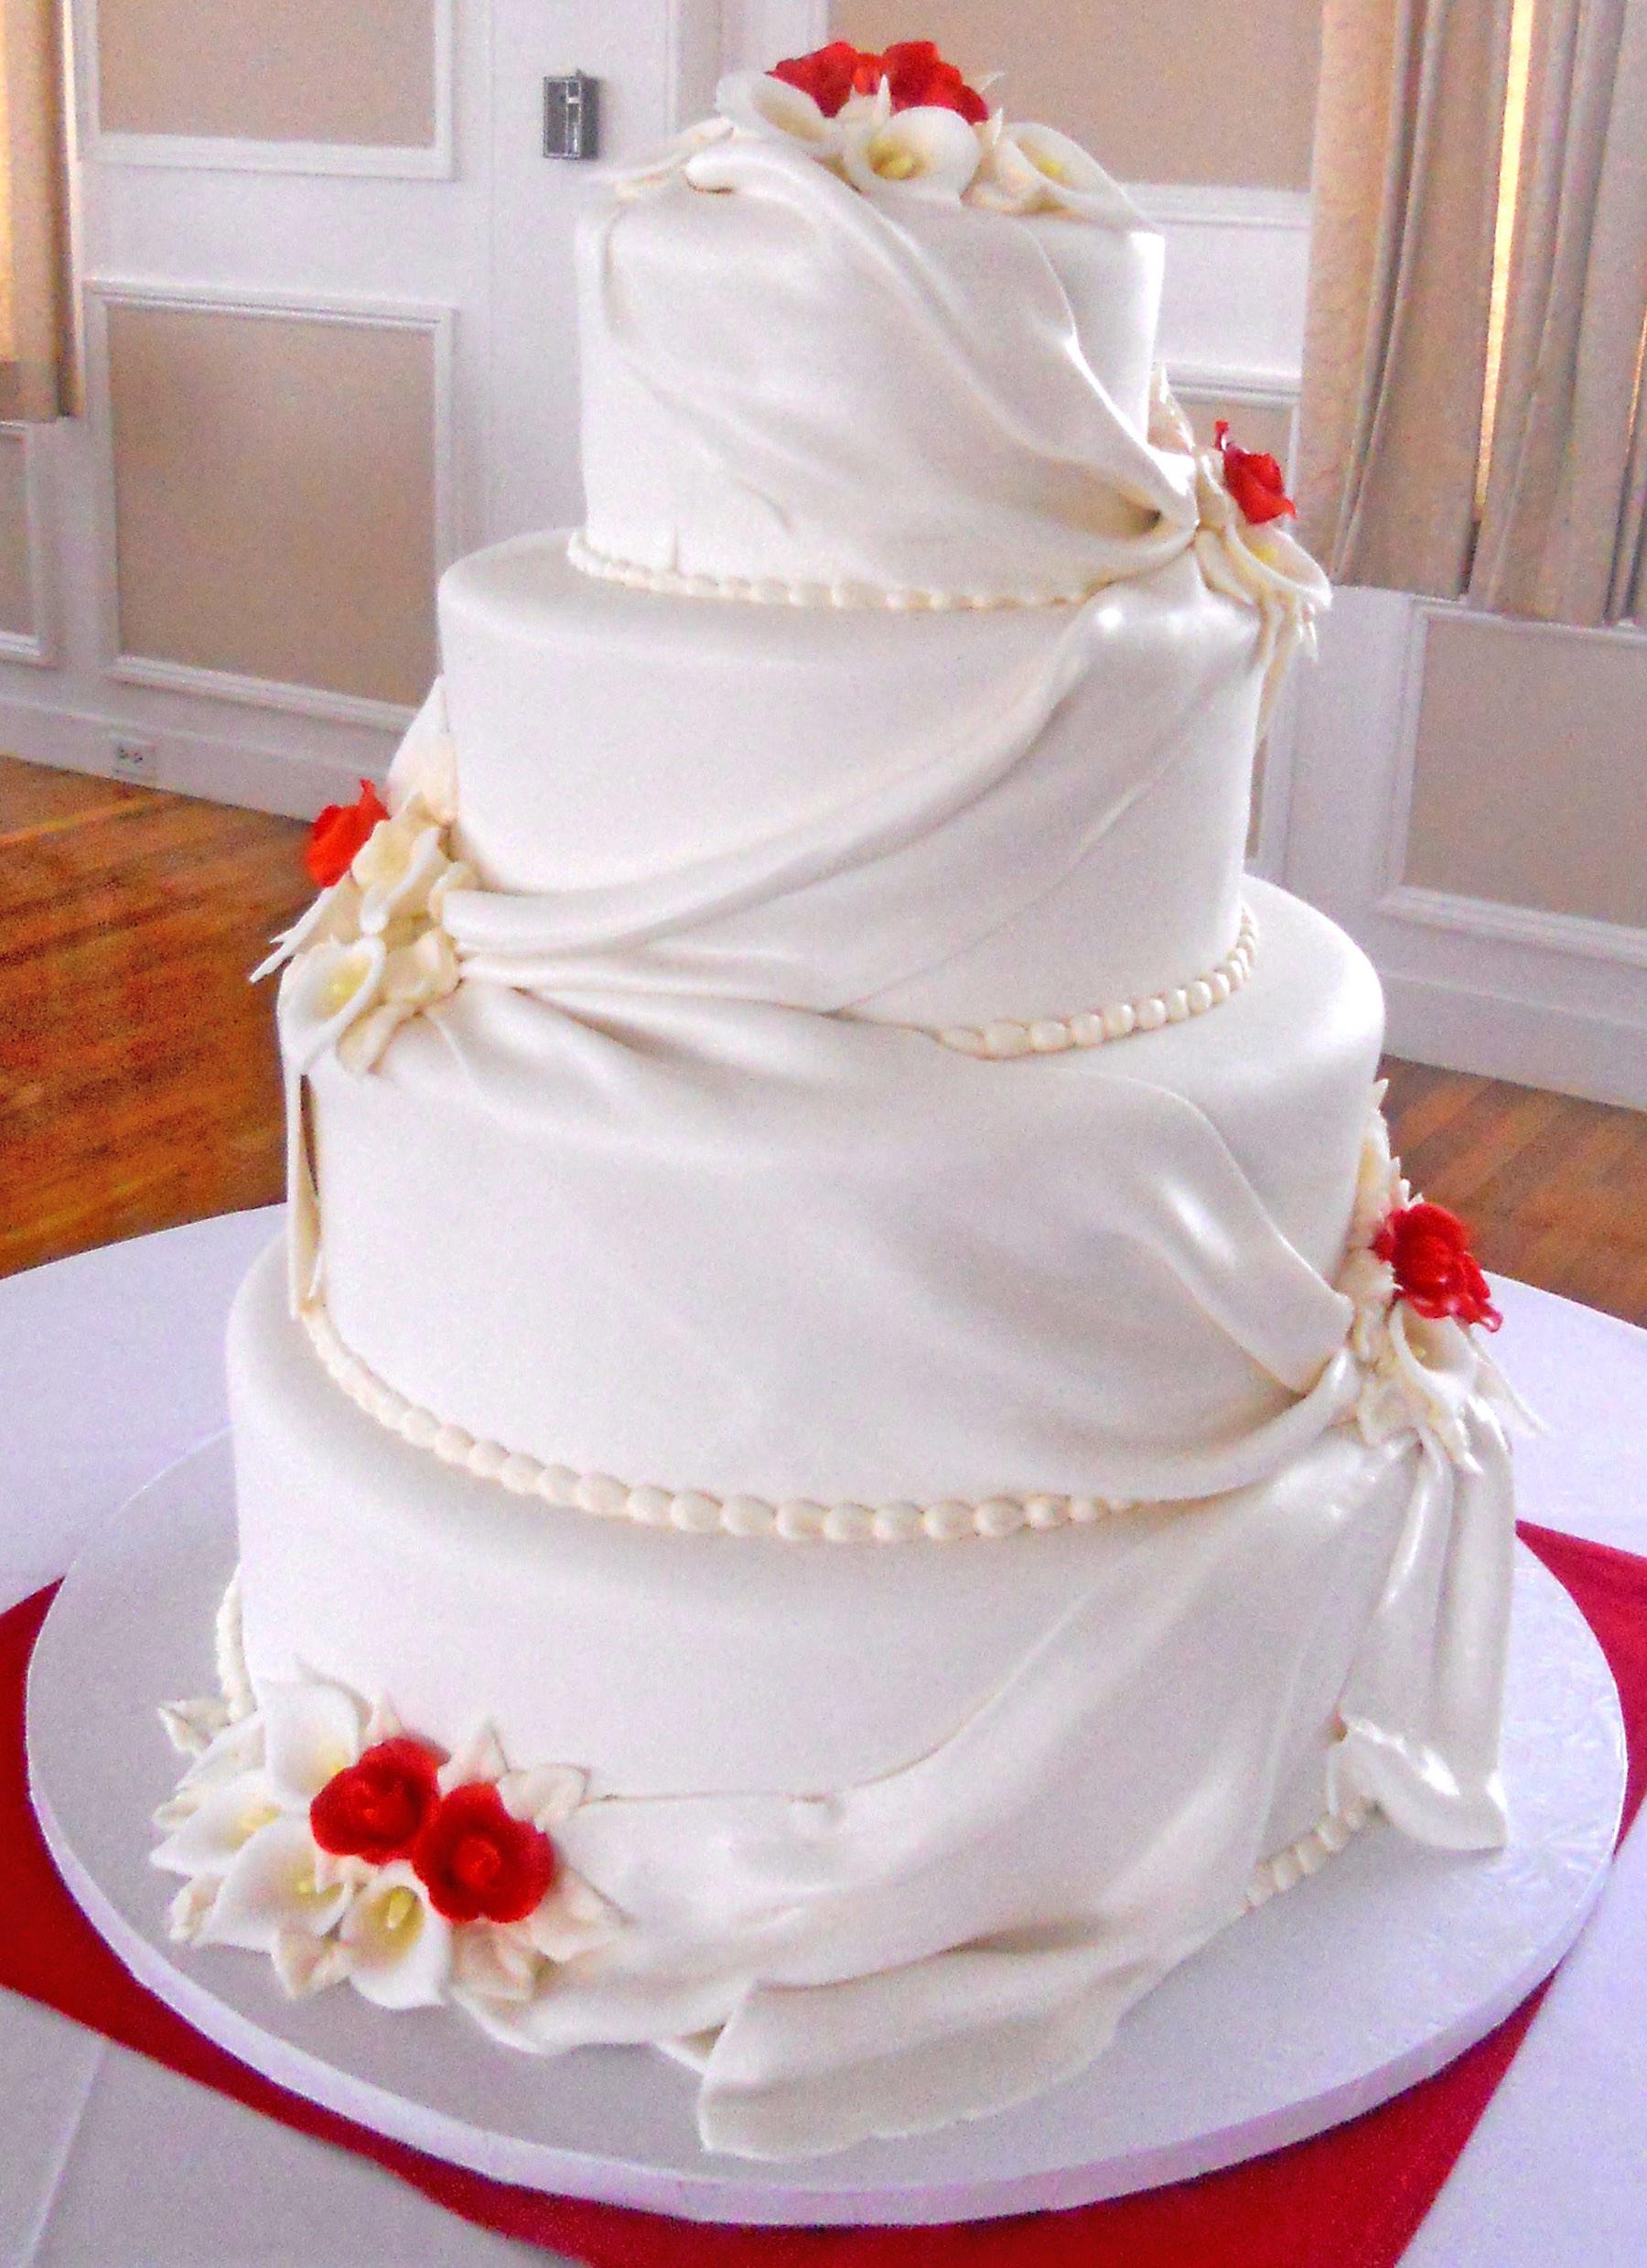 Beautiful Wedding Cakes Pictures  Amazing Wedding Cakes for Amazing Events Registaz